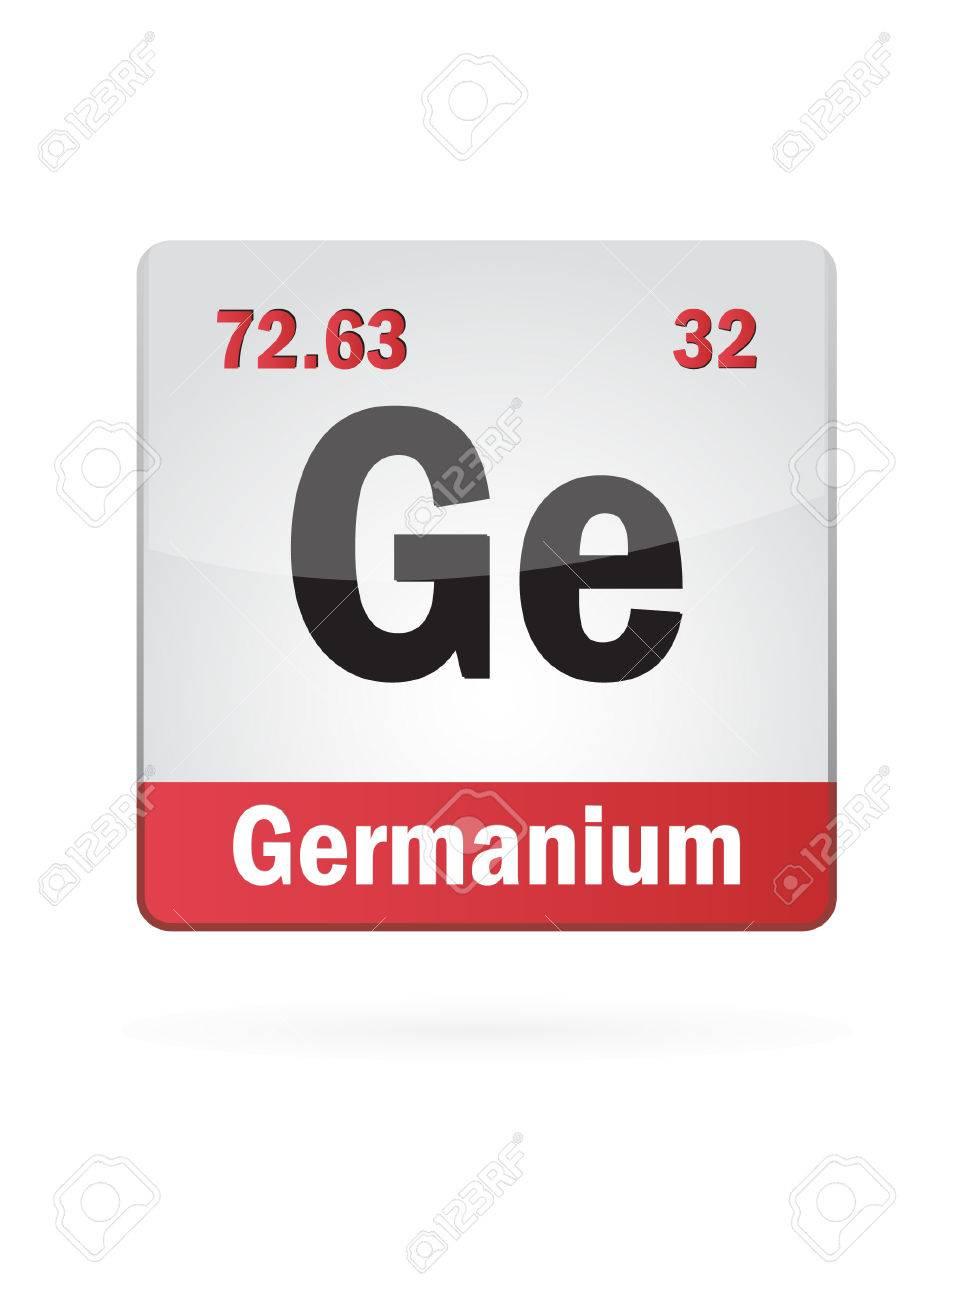 Germanium Symbol Illustration Icon Royalty Free Cliparts Vectors